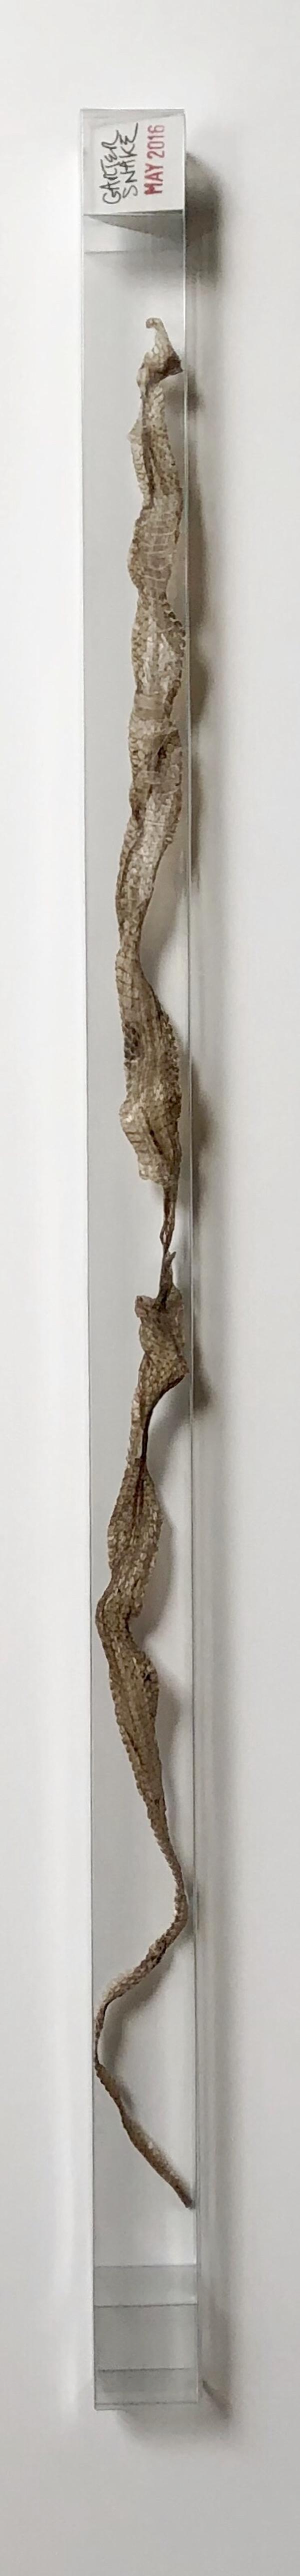 2016 05 garter snake skin.jpeg